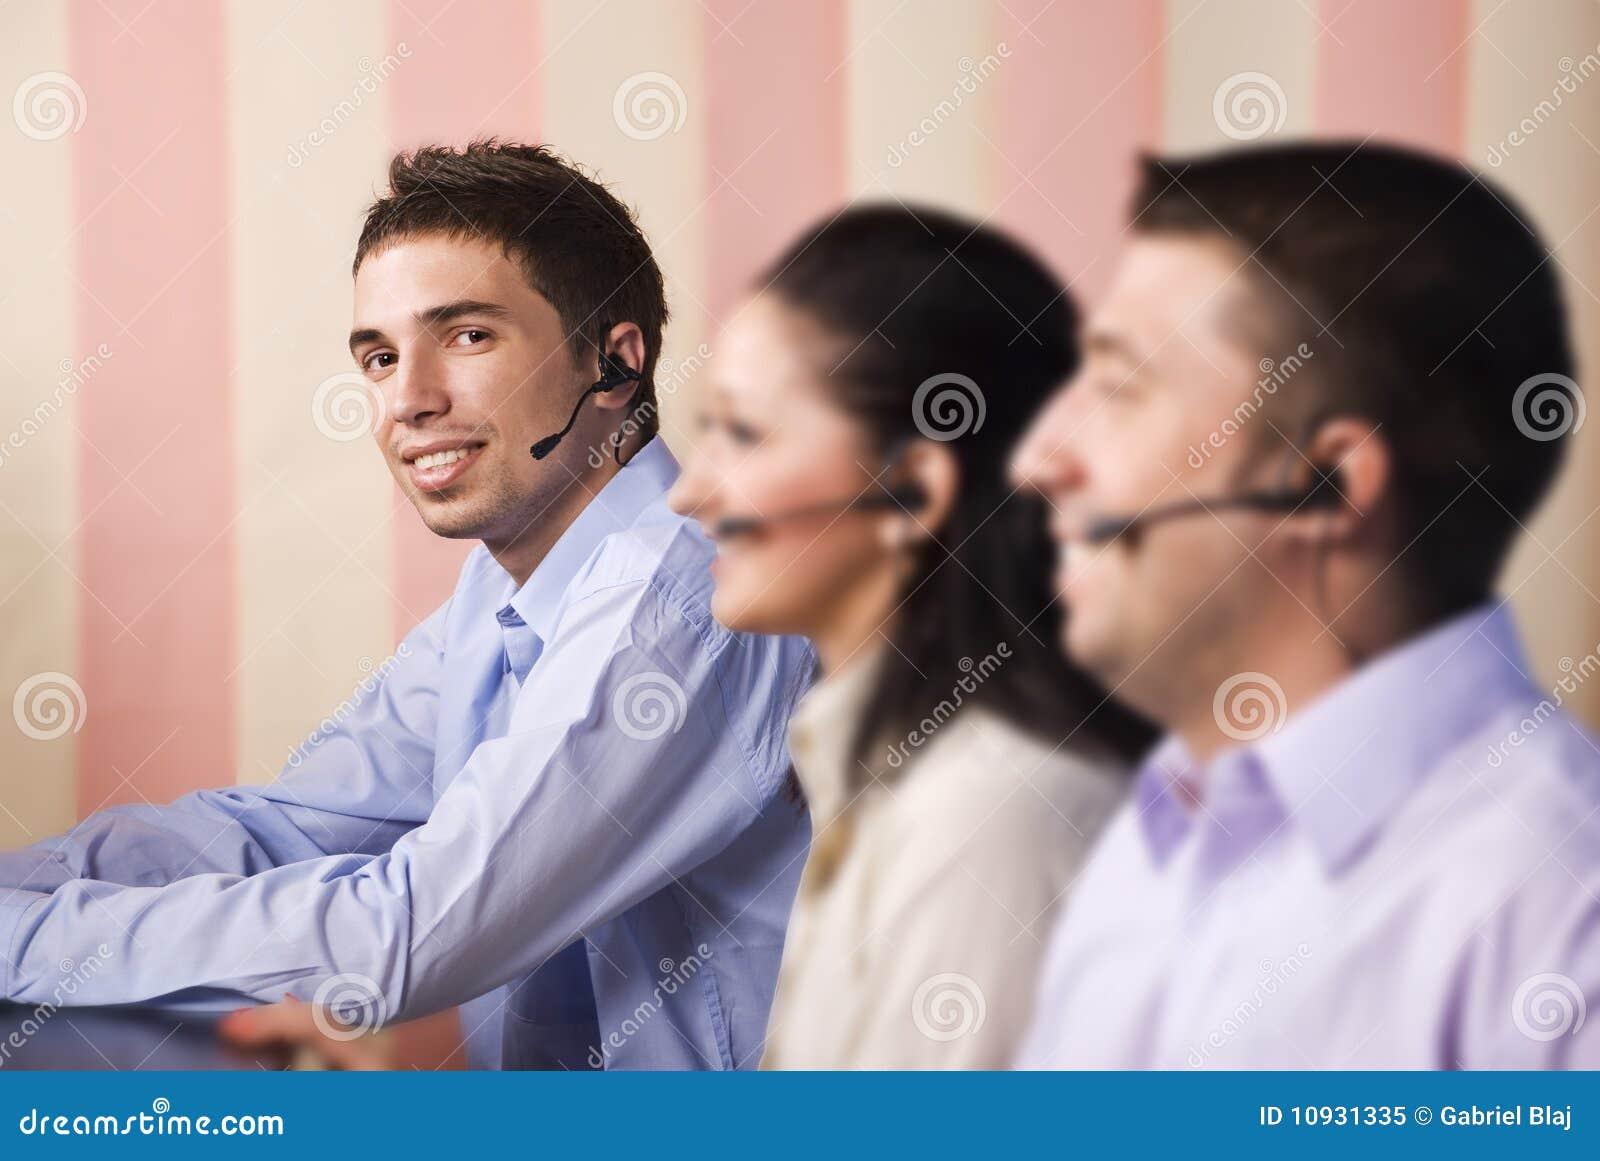 Operadores do centro de chamadas